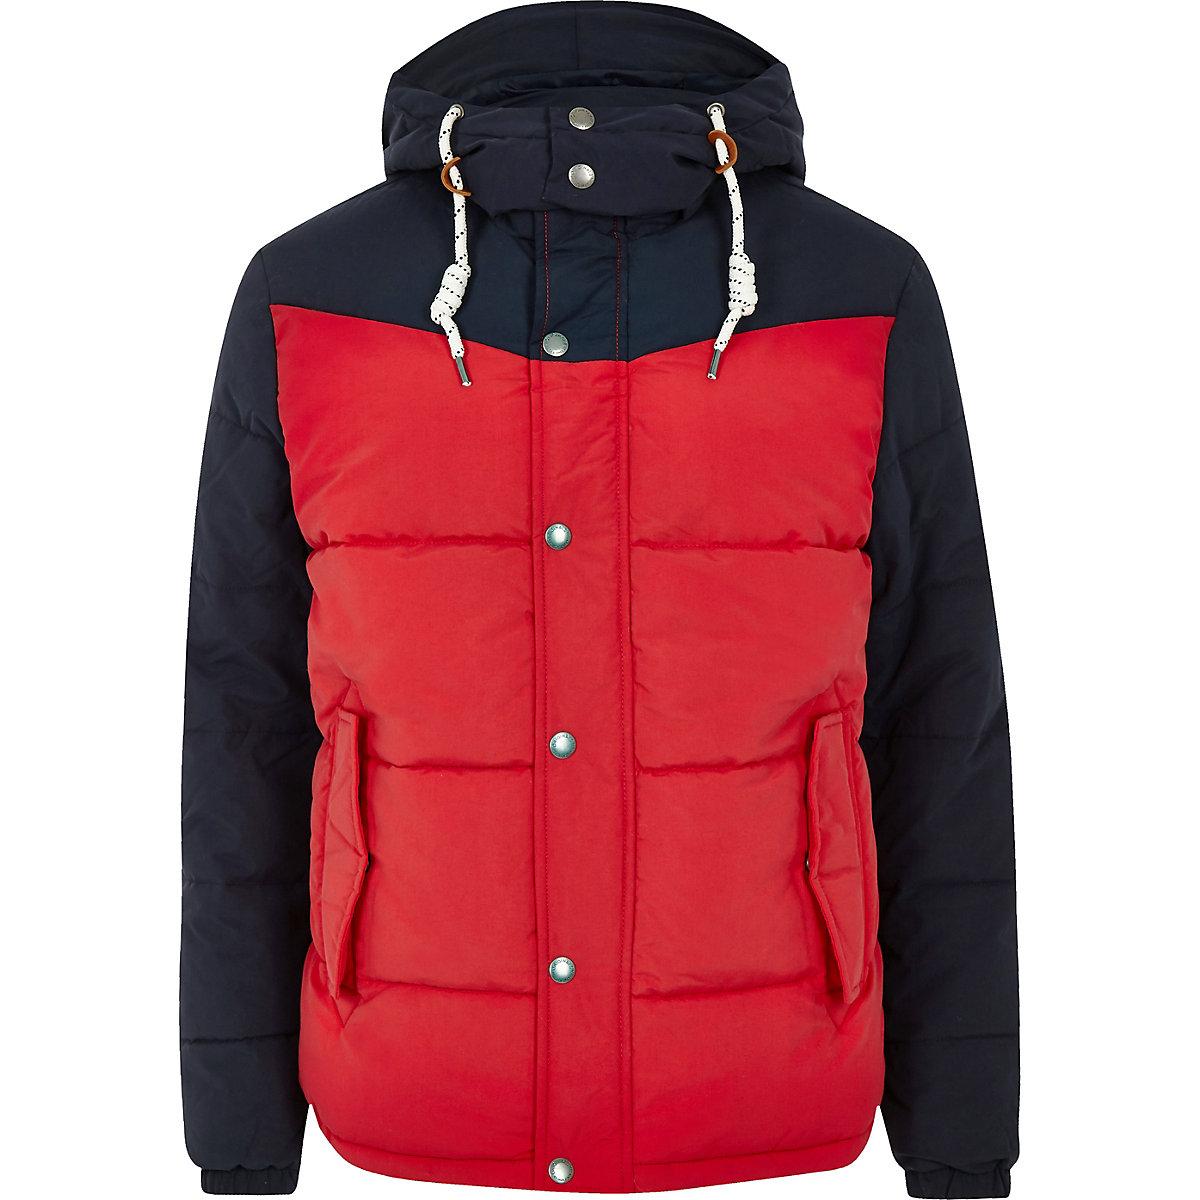 Jack & Jones red hooded puffer jacket